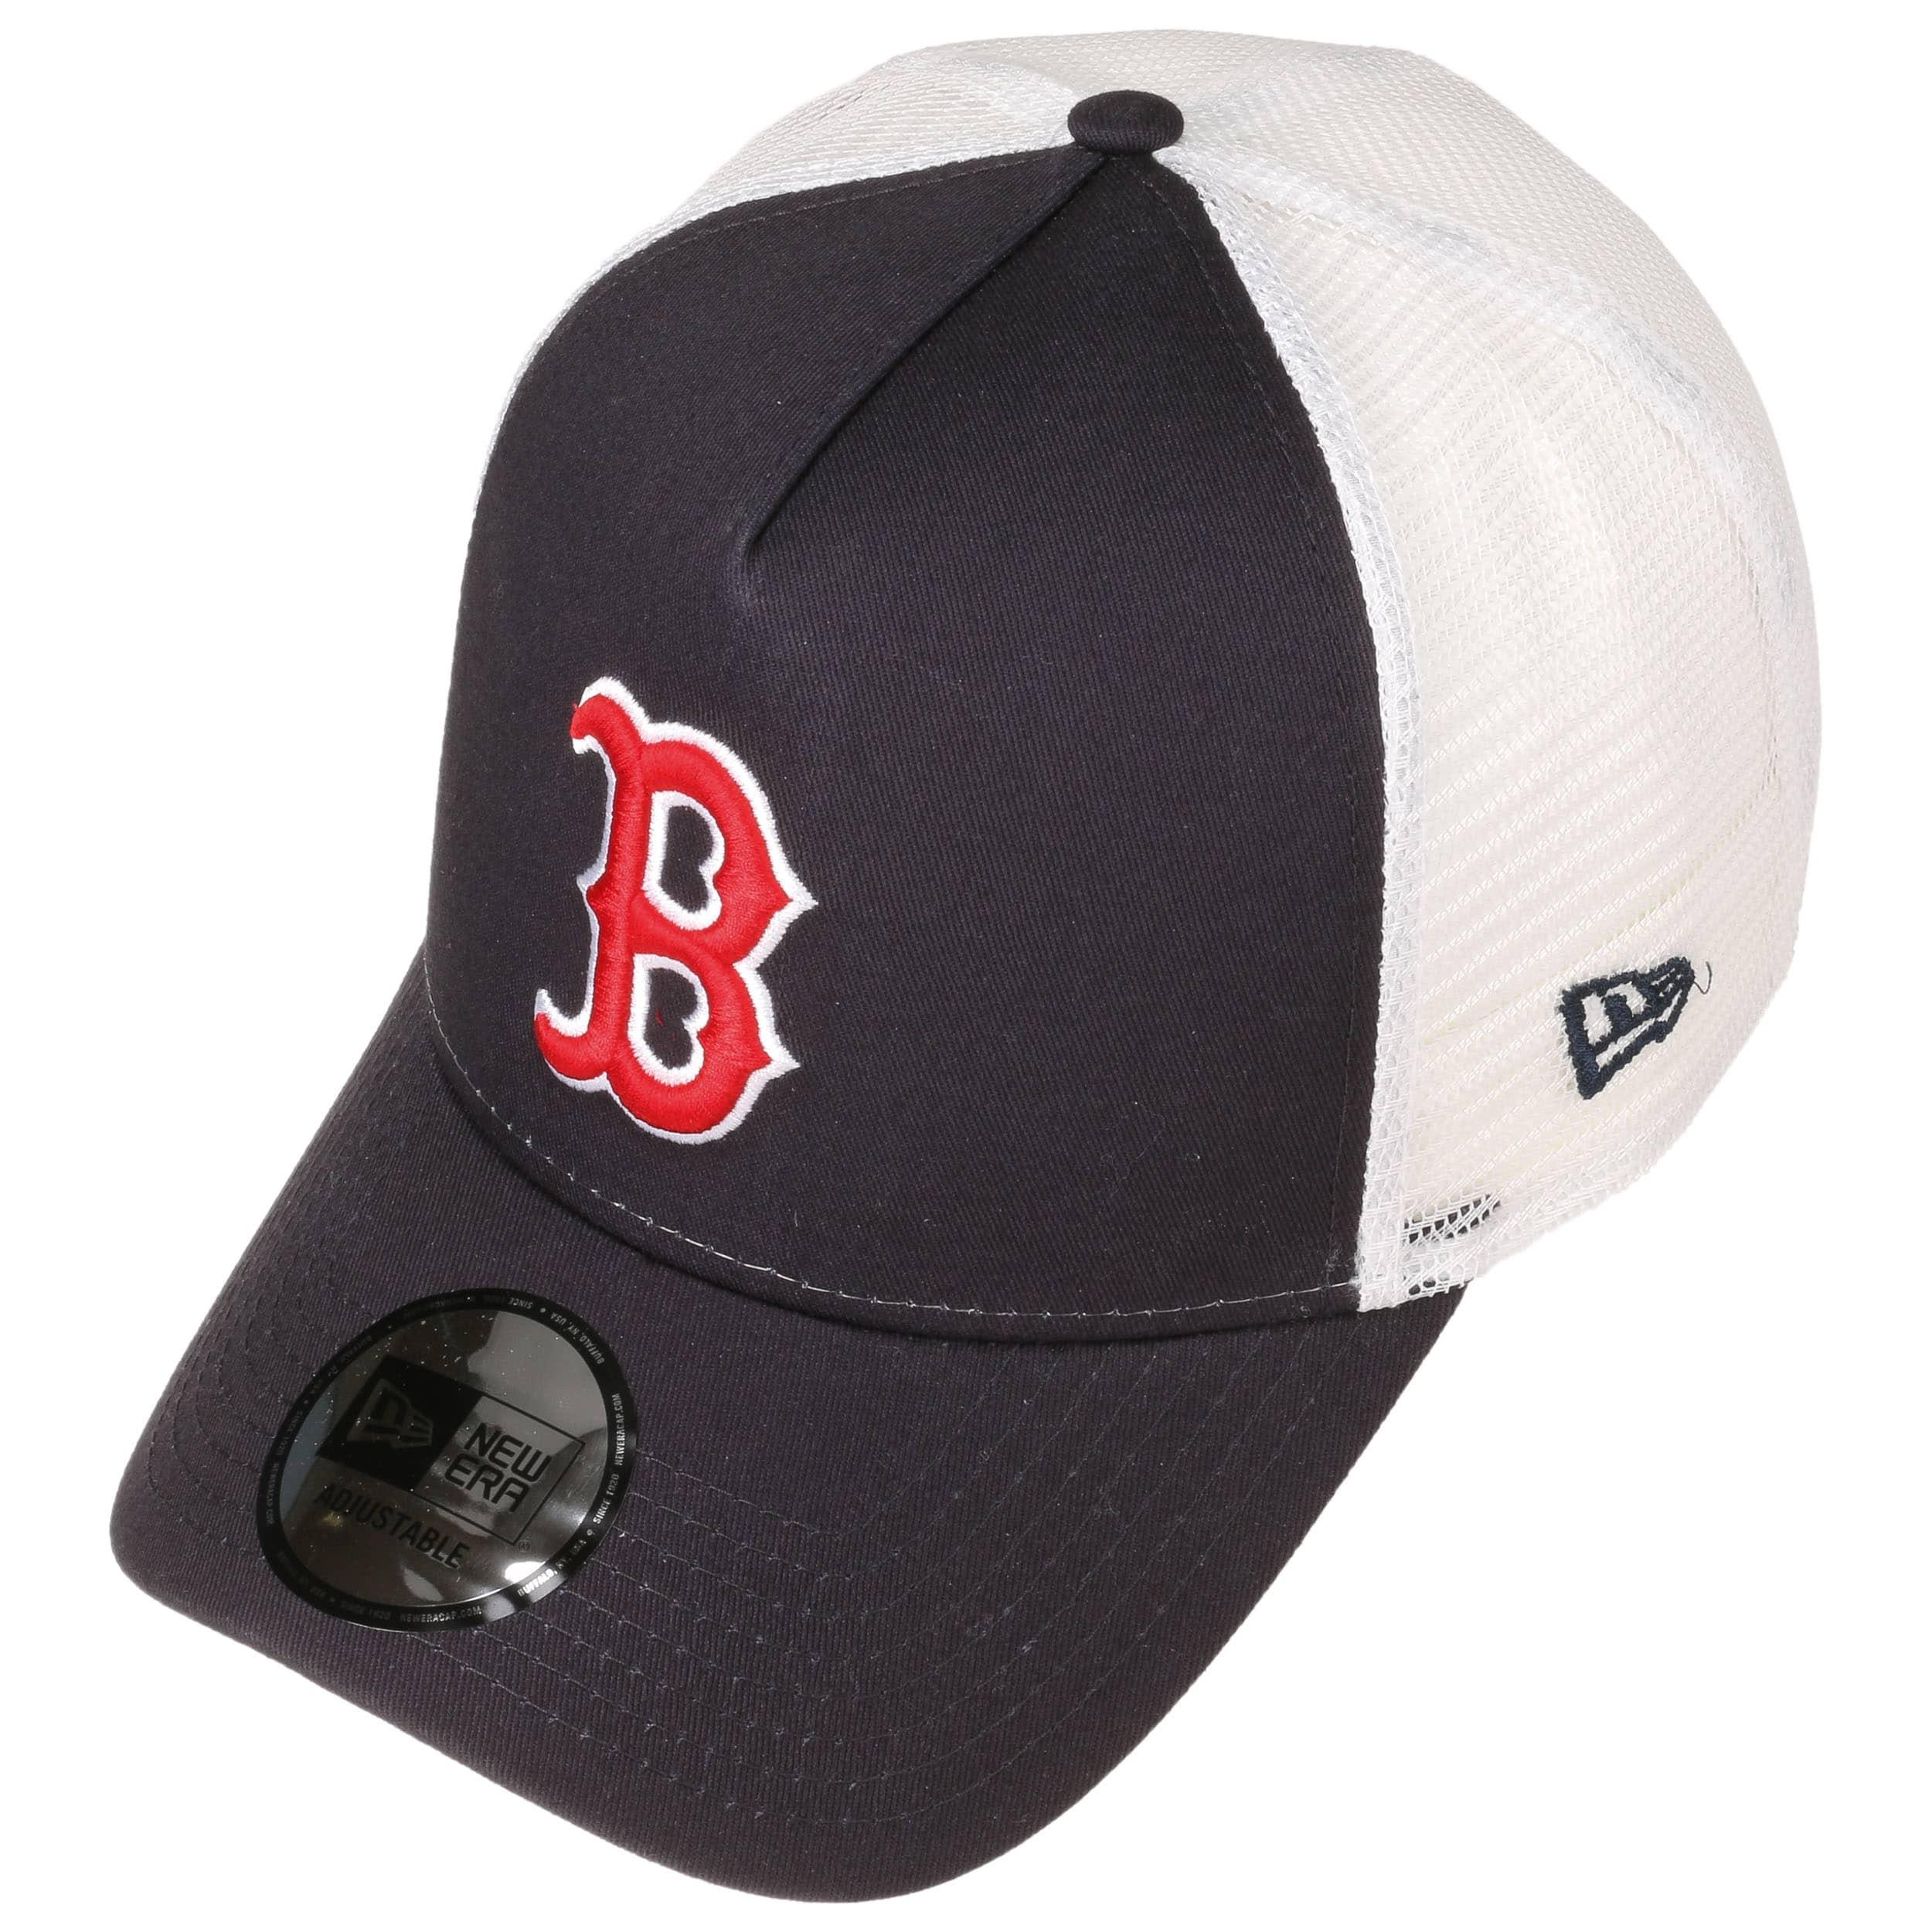 3f75d9dc311 ... caps hatstoreworld 28dd1 f4649  coupon for team ess red sox trucker cap  by new era navy 1 24e50 3ea36